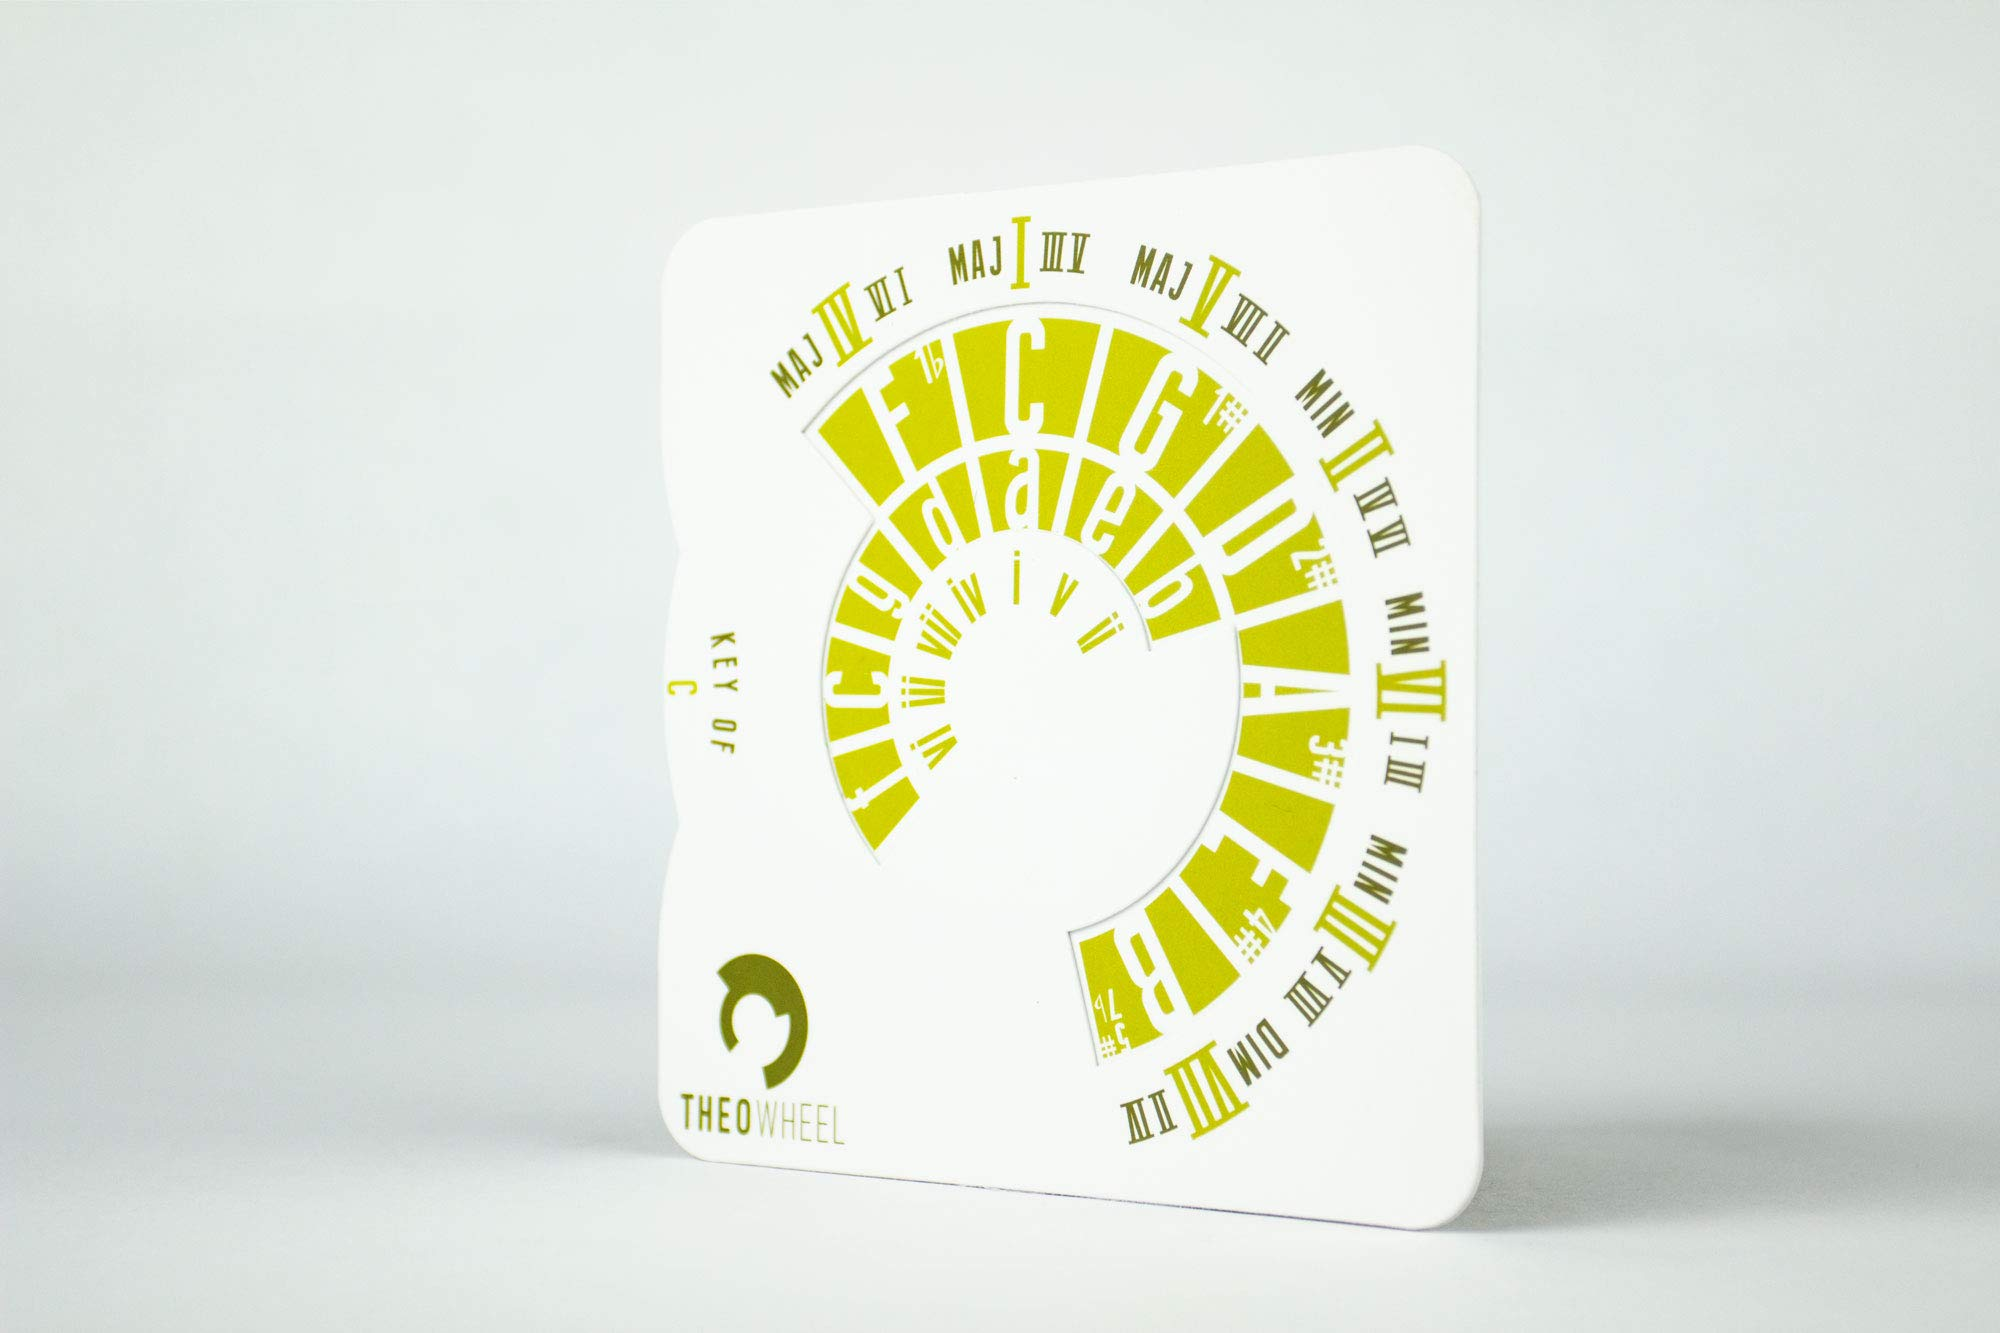 Theo Wheel - Music Theory Made Simple (Yellow - Rock)